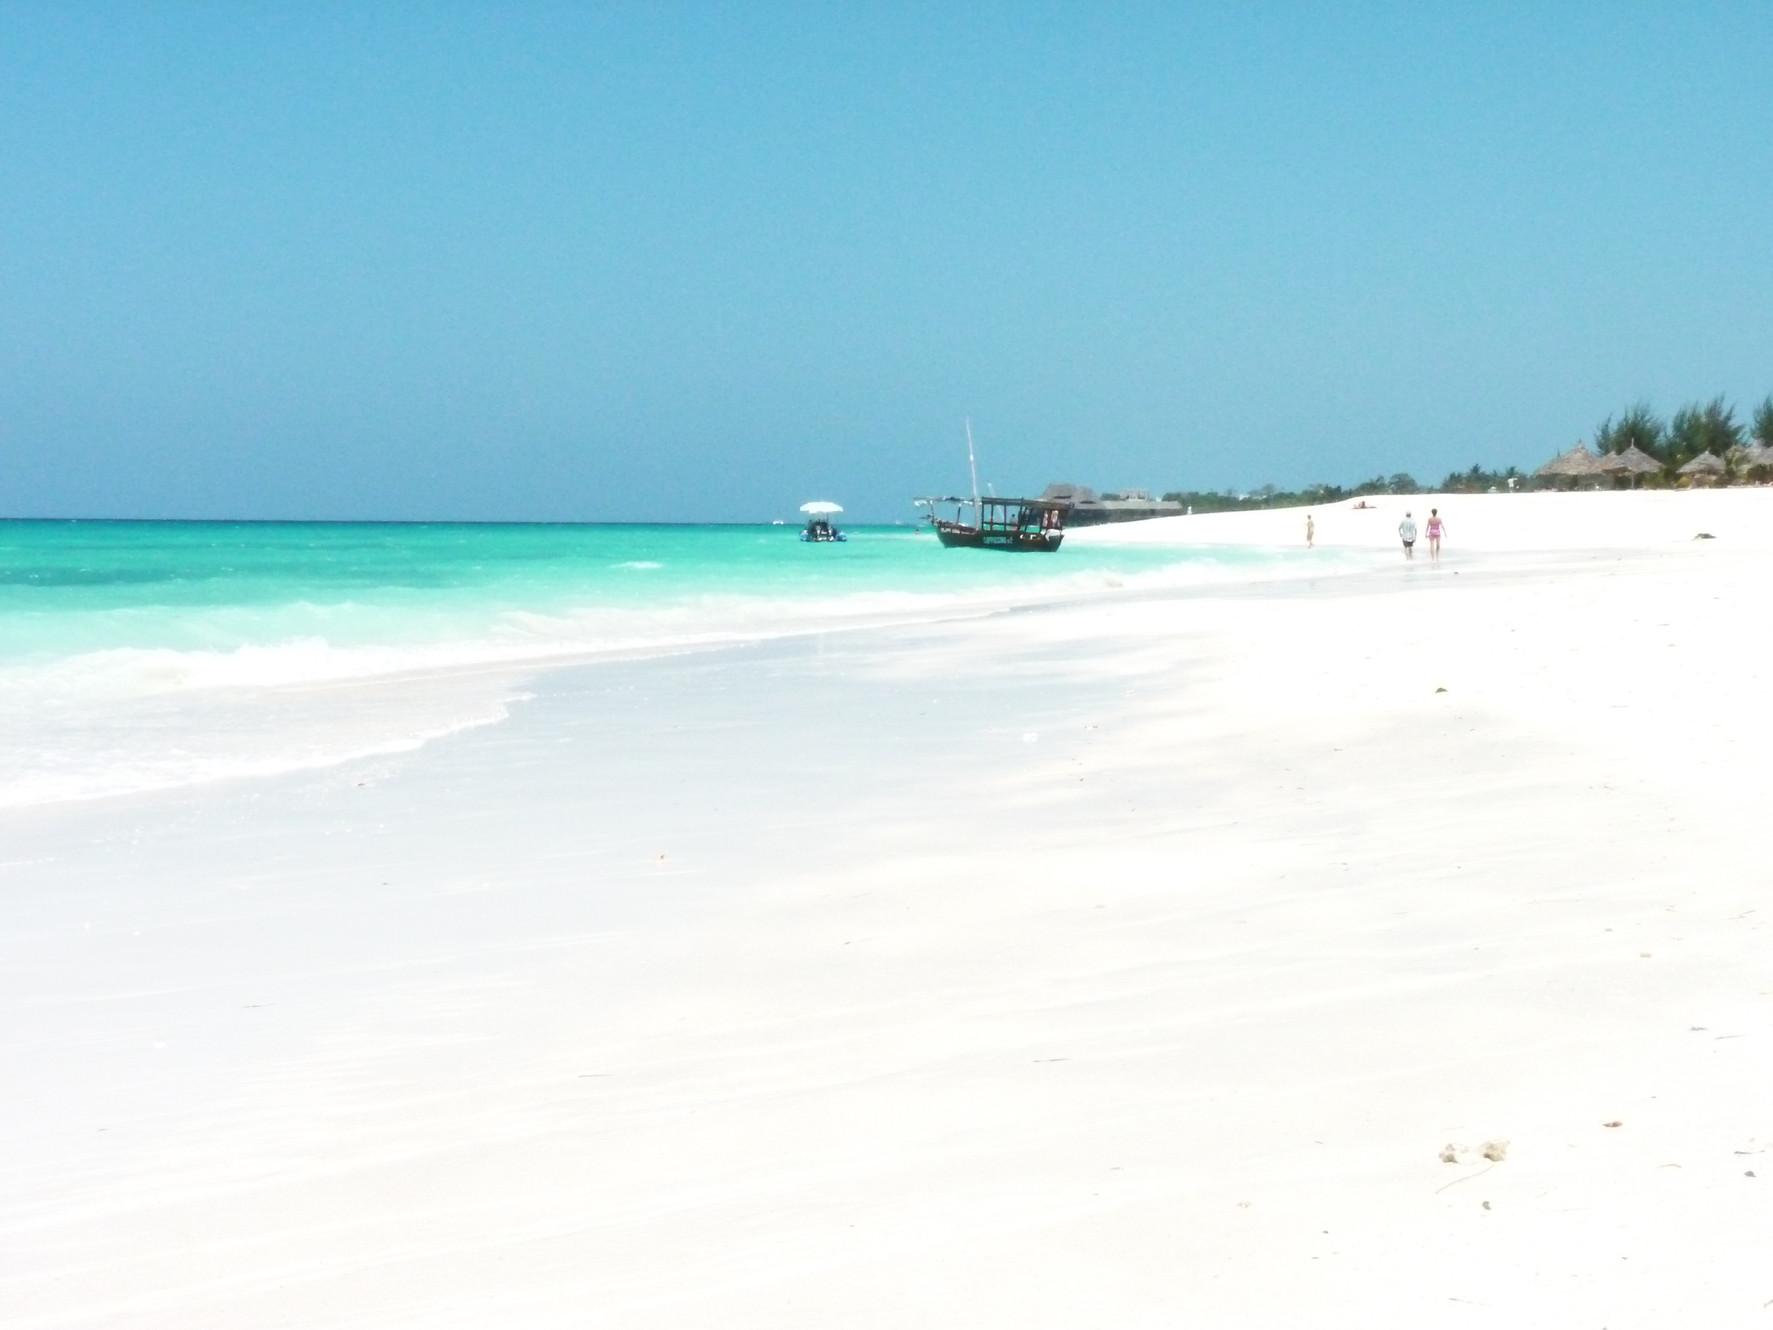 Kendwa BiancheOceano A Villaggi ZanzibarDa NungwiTra E Spiagge OZiTPkuX